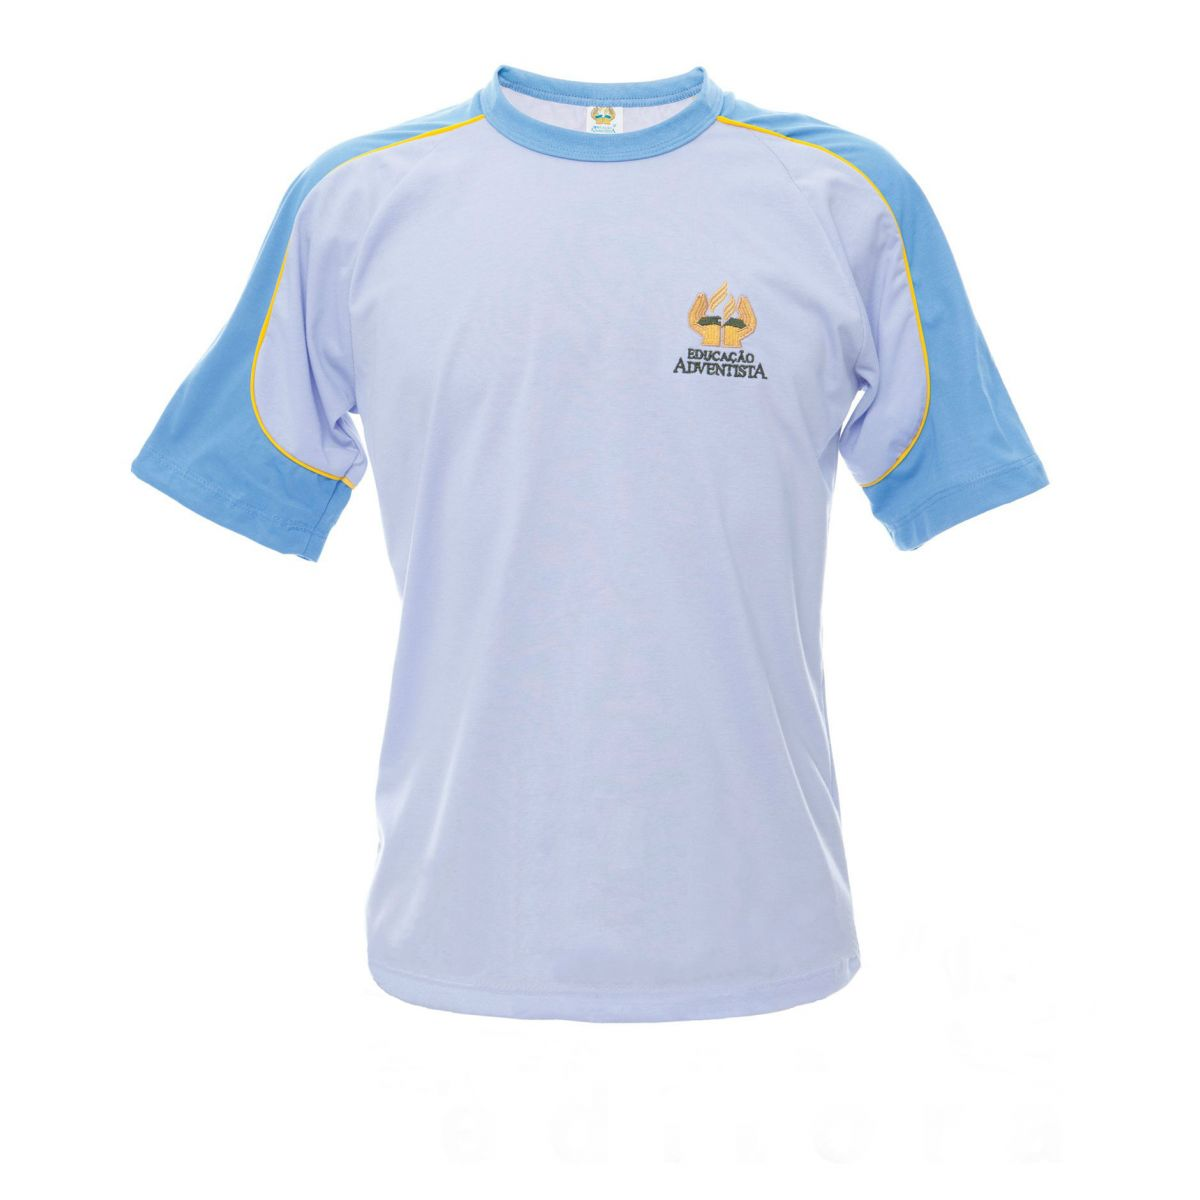 Camiseta Manga Curta - GGGA